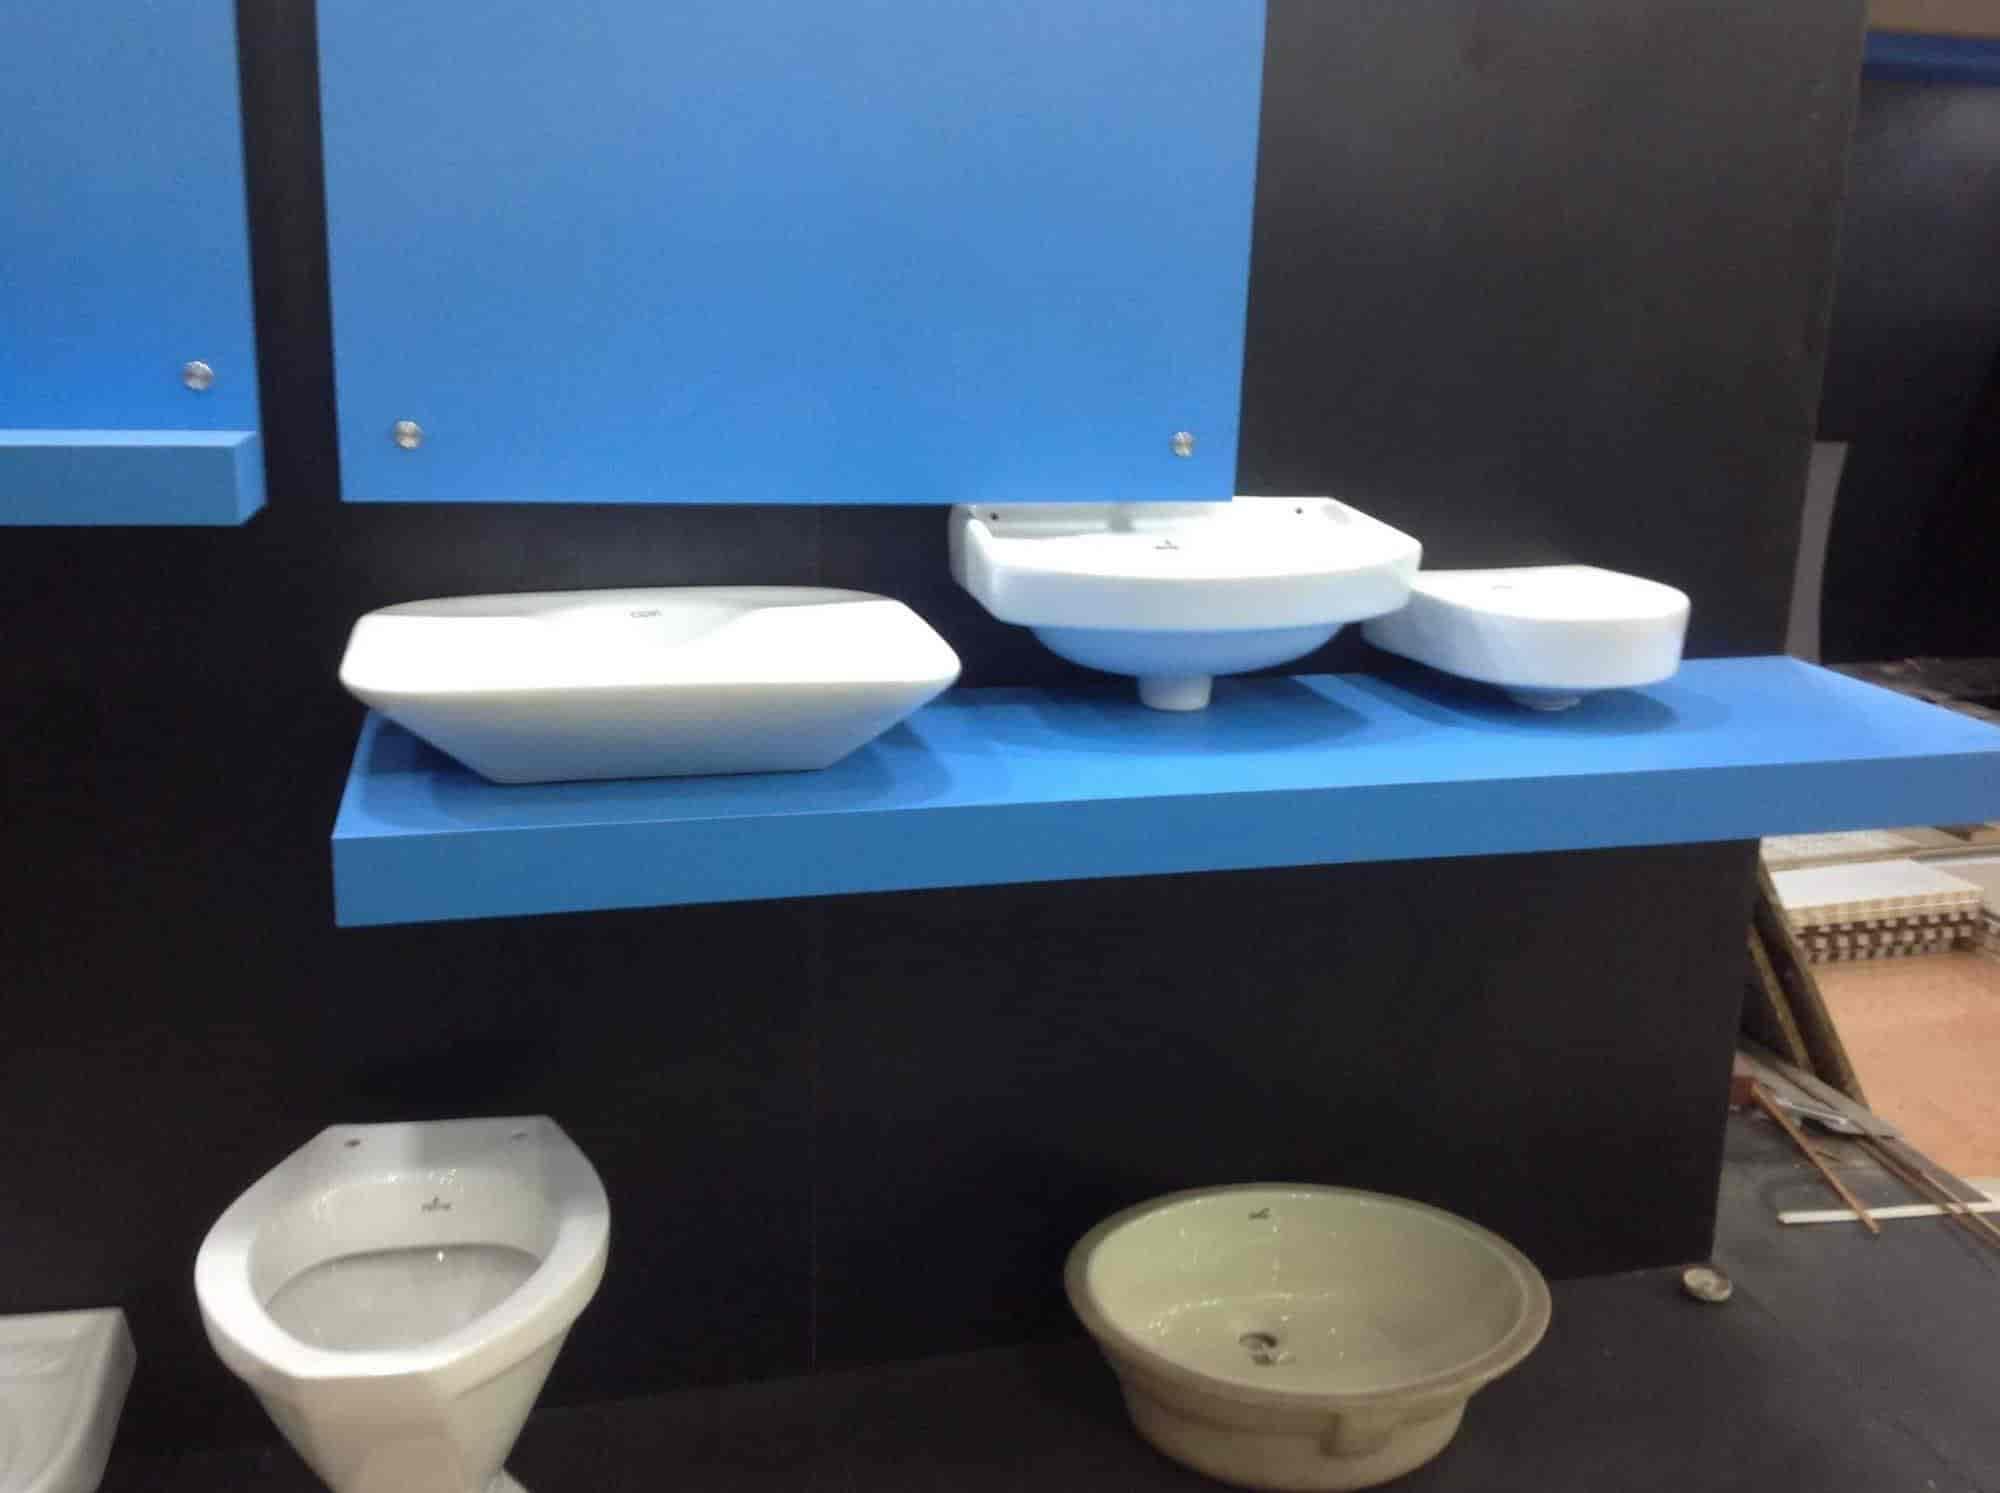 Alankar Bat, Raipur HO - Alankaar Bat - Bathroom Accessory Dealers ...